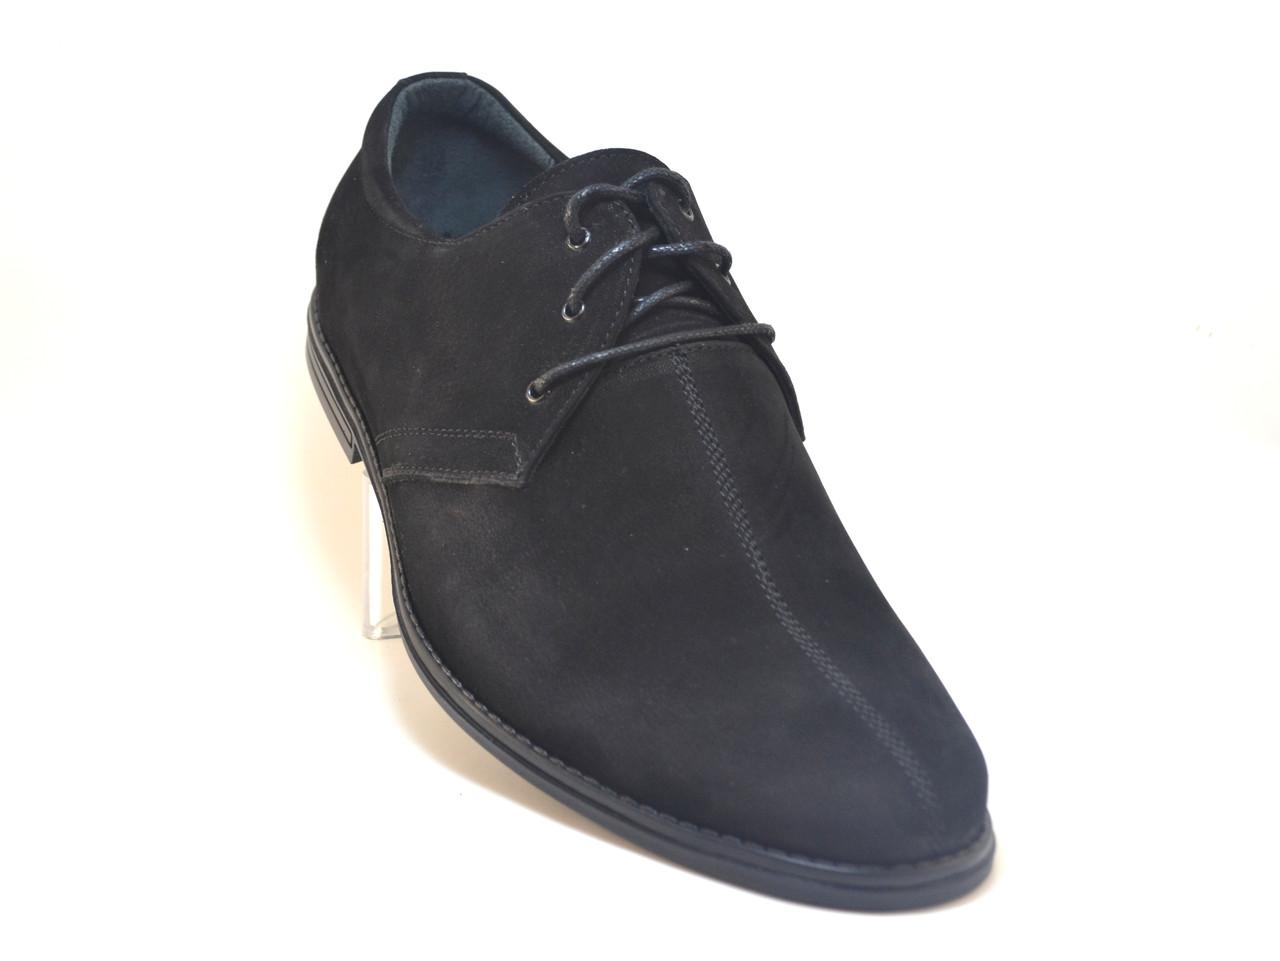 f0cffe34e Обувь большой размер мужской. Туфли кожаные нубук Rosso Avangard Carlo  Attraente Сamoscio Nero NUB